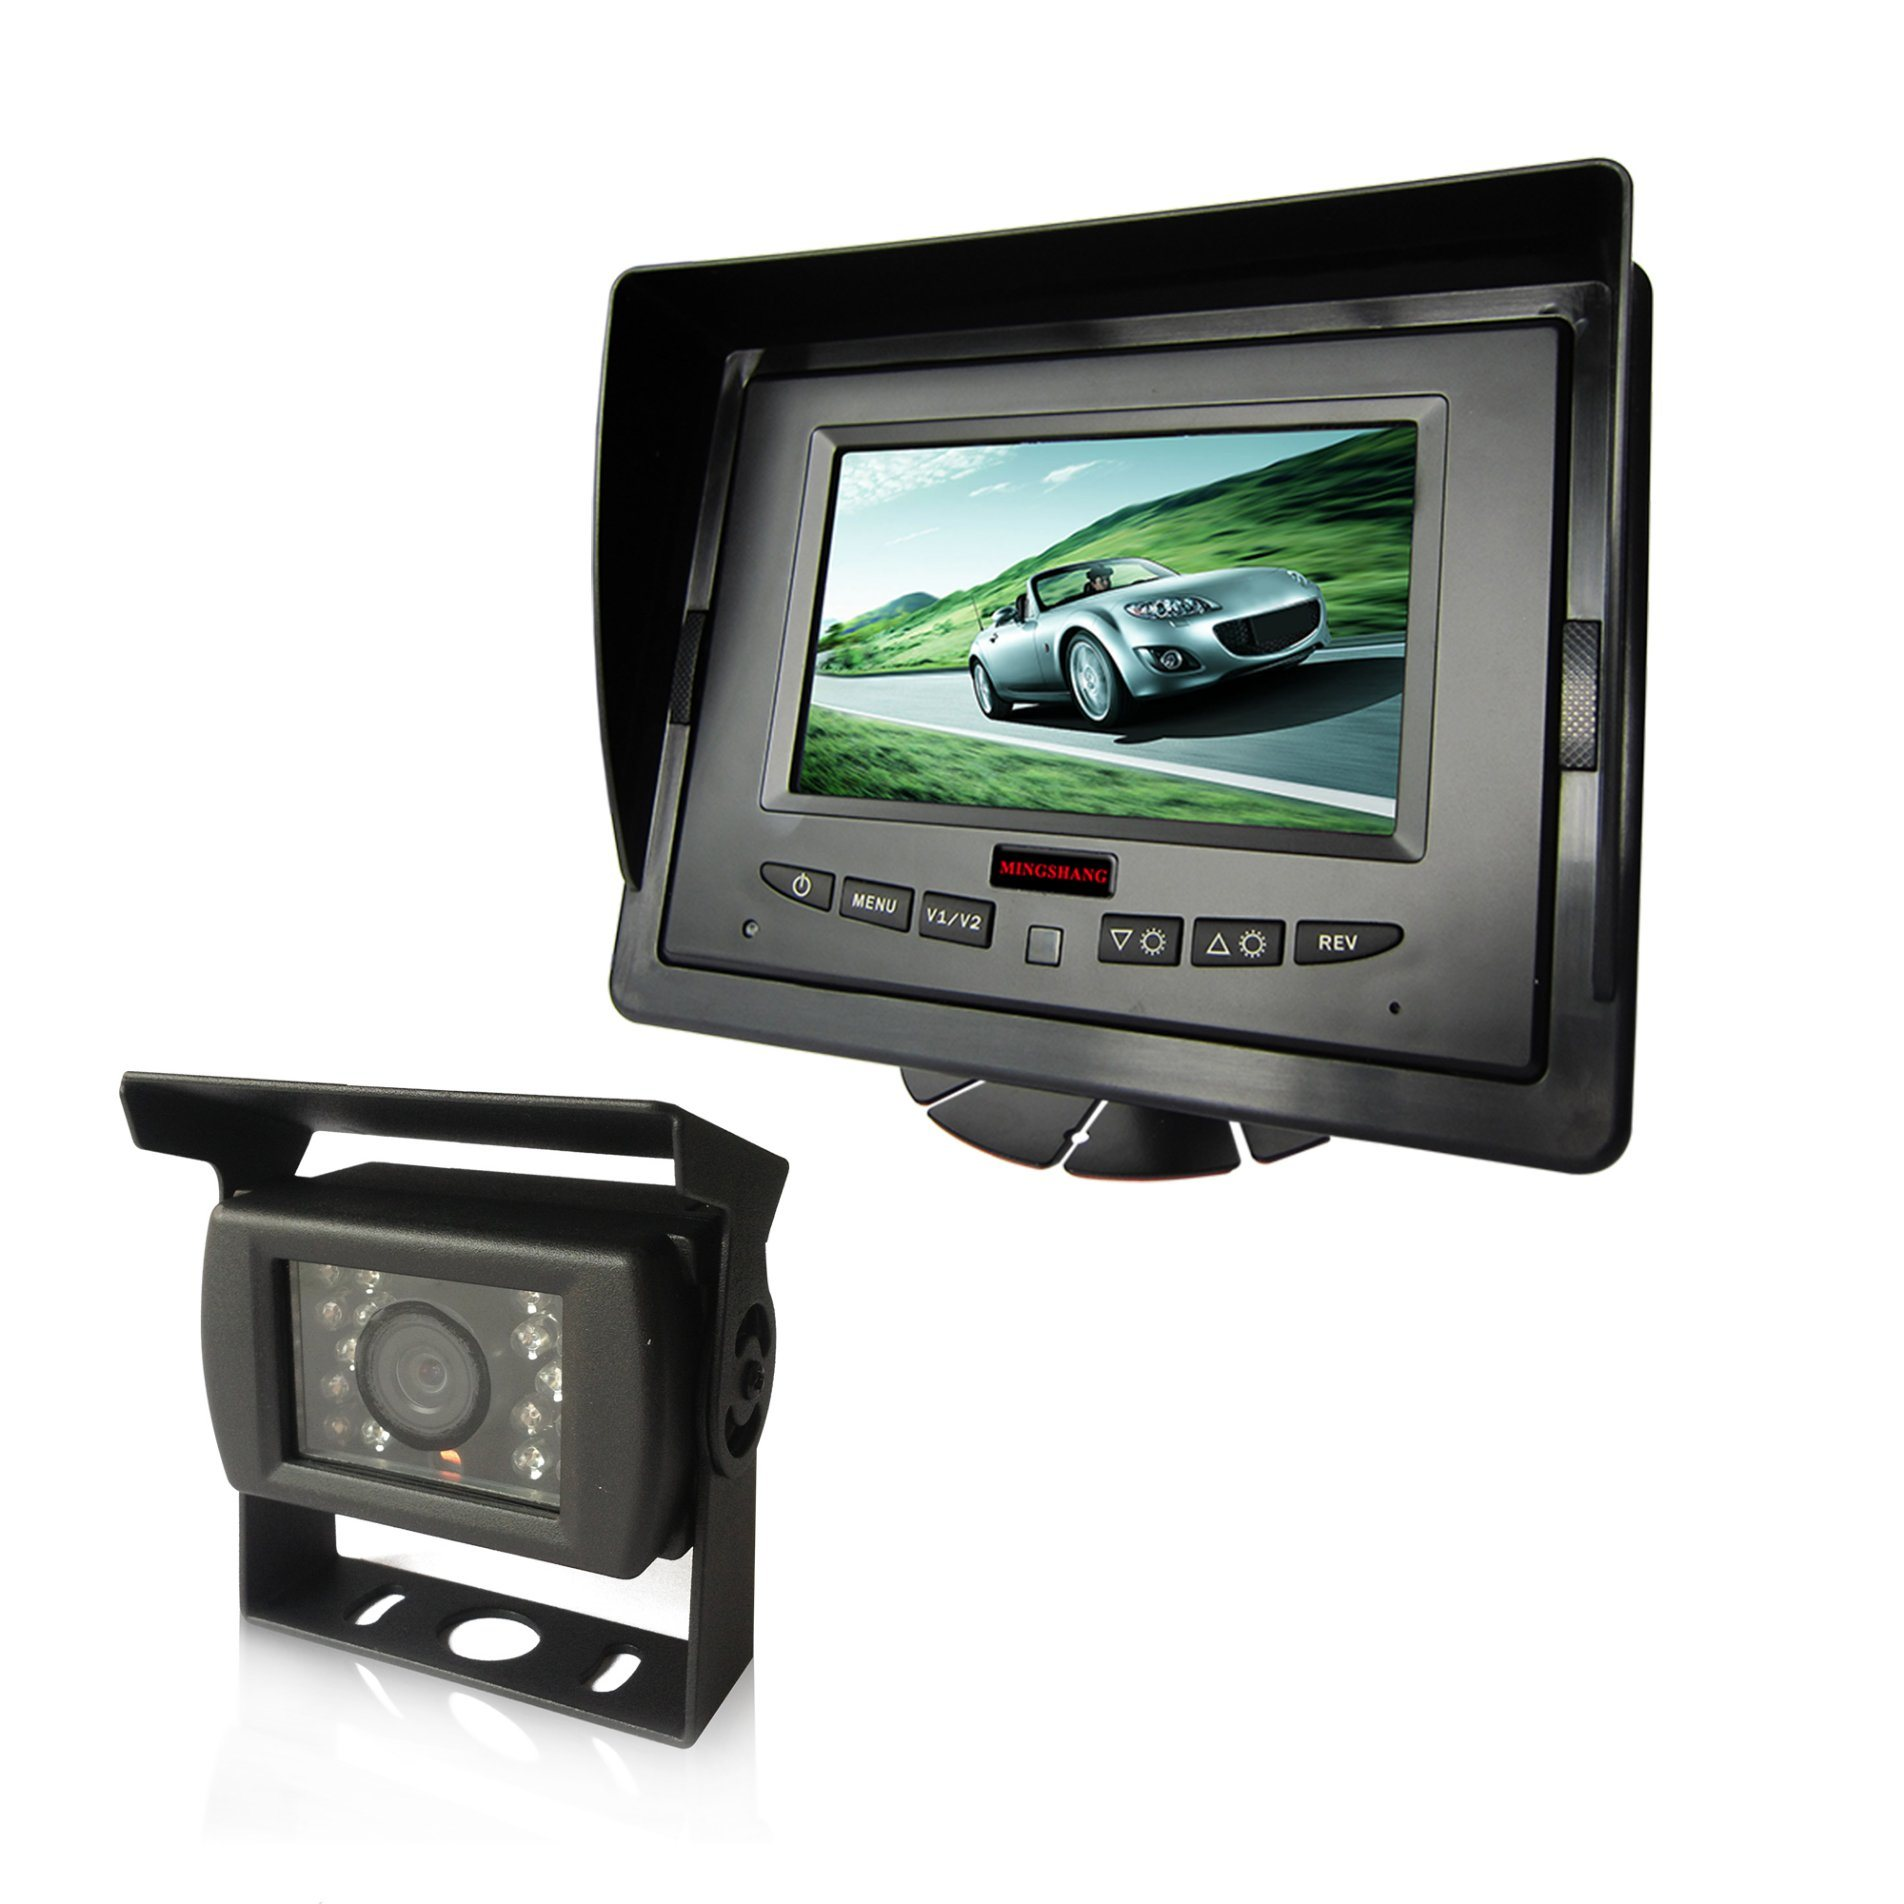 5 Inch Digital LCD Car Rear View Backup Monitor for Bus, Trucks